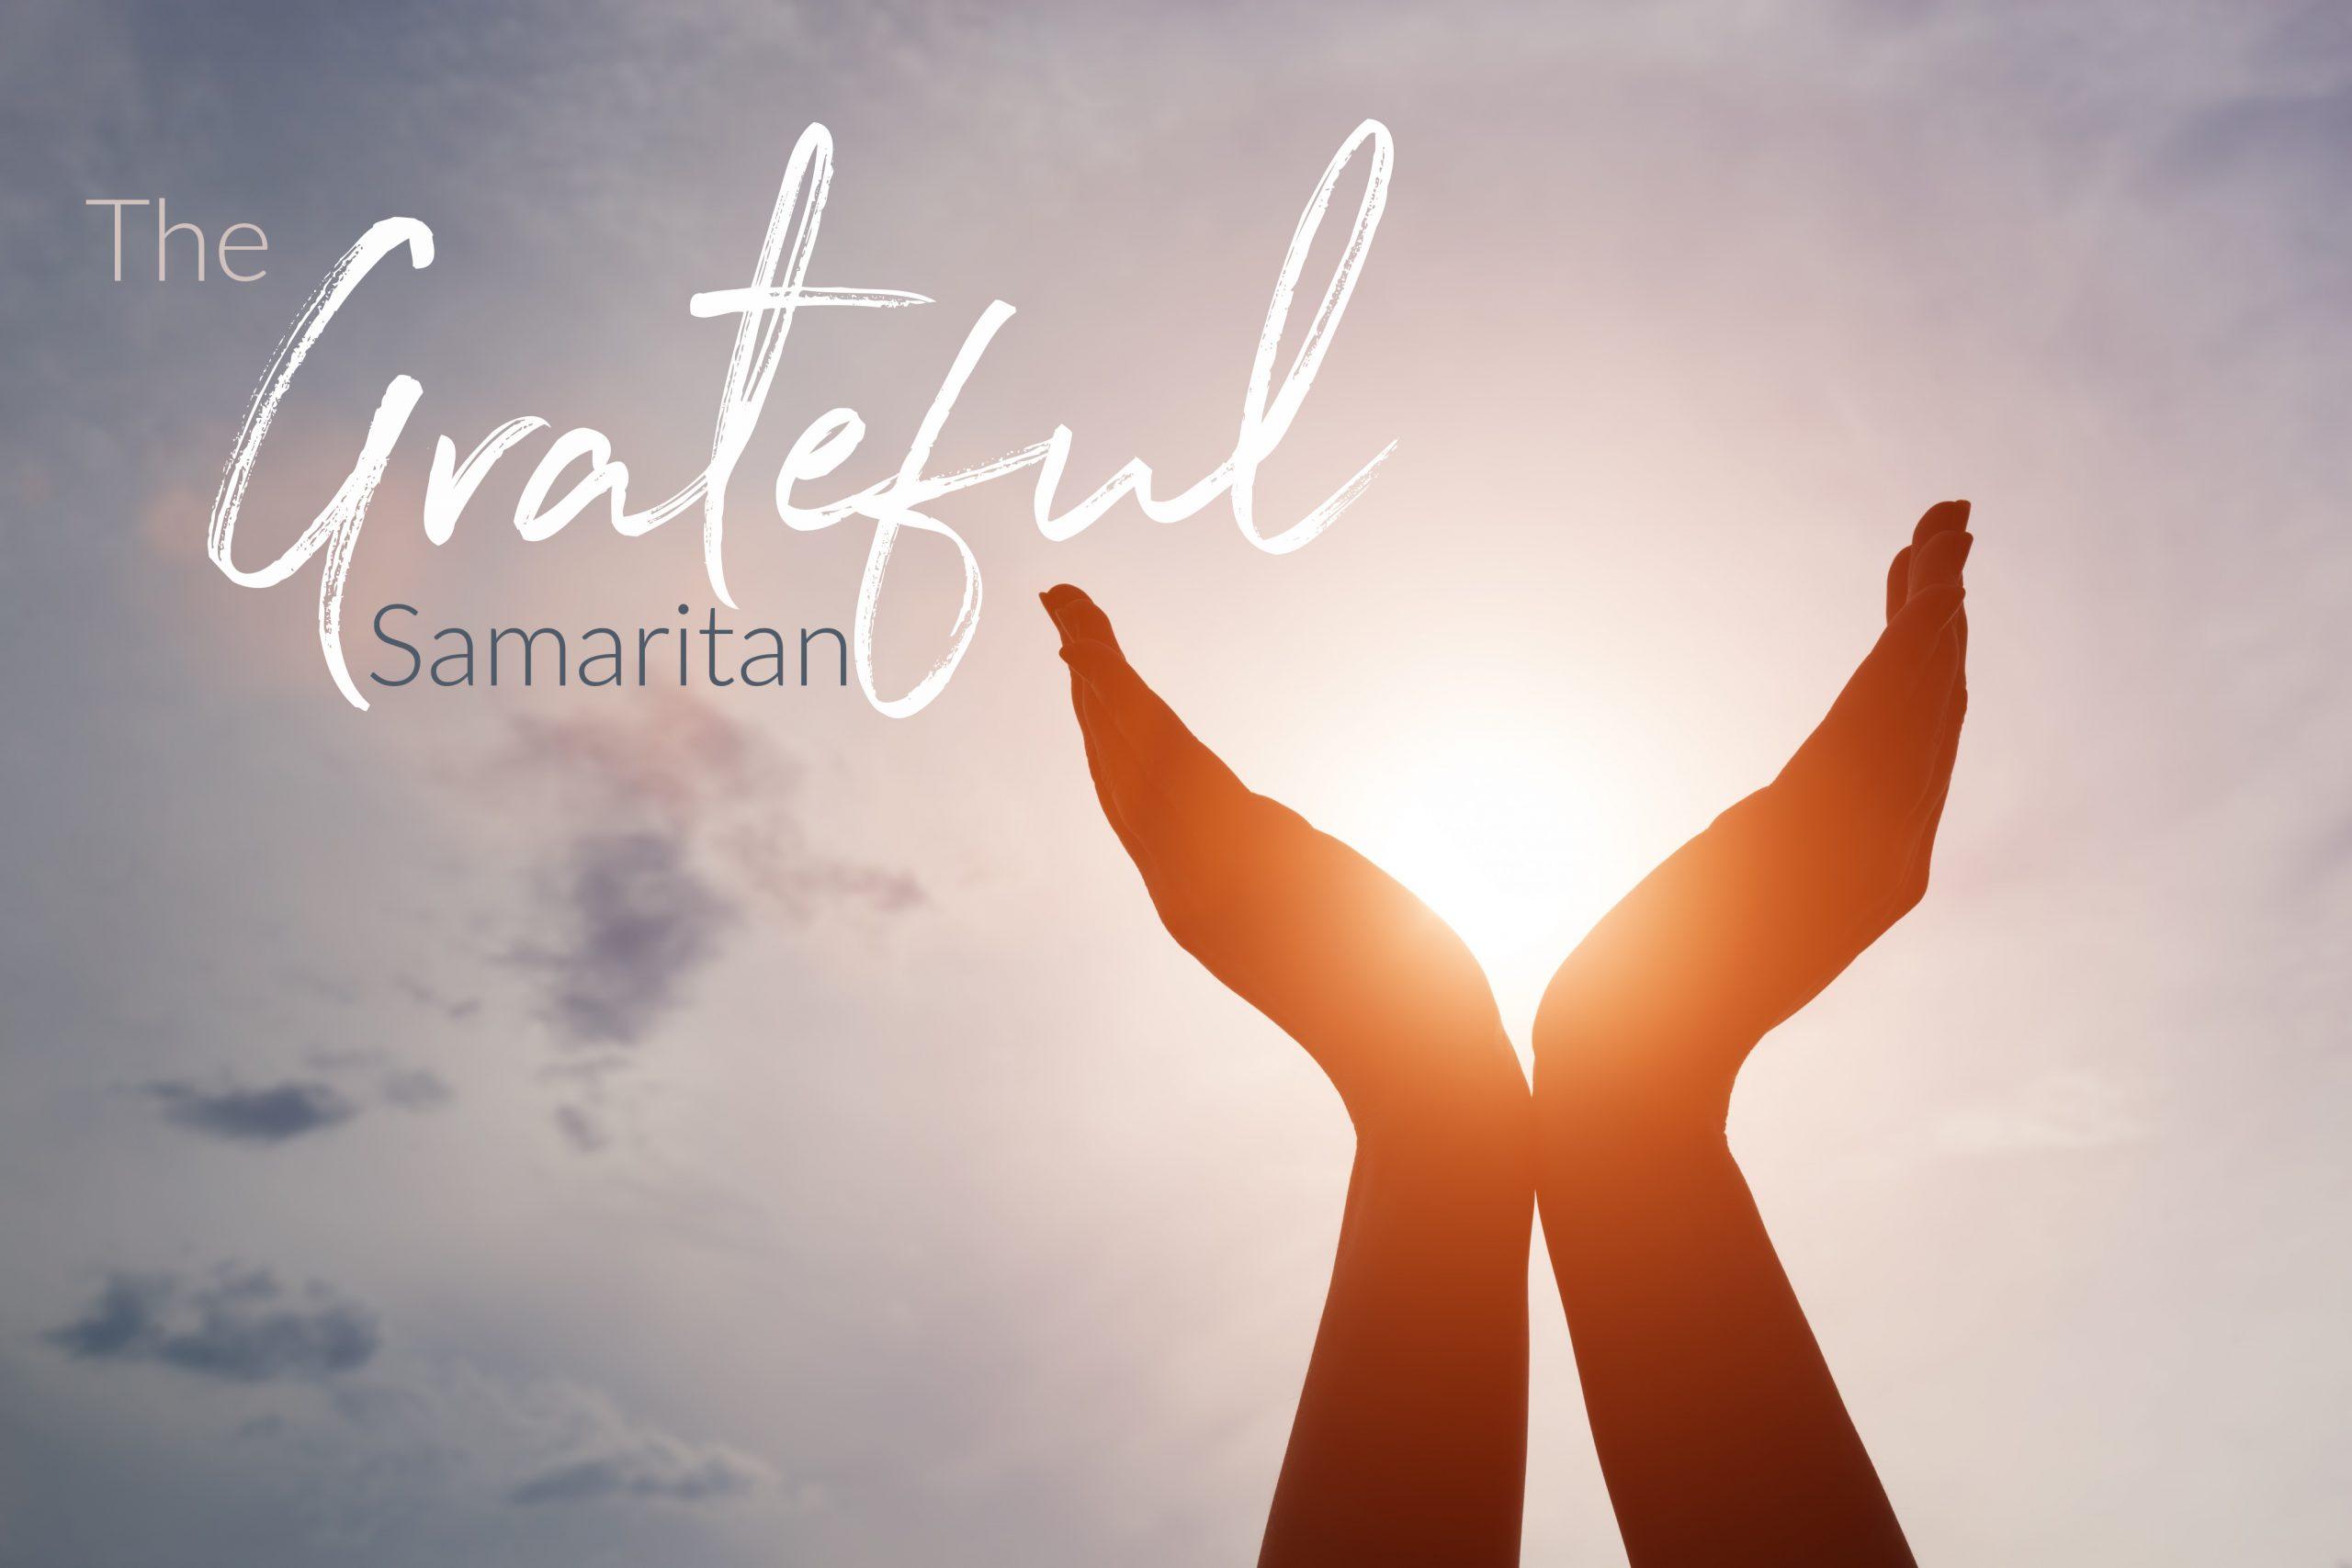 The Grateful Samaritan